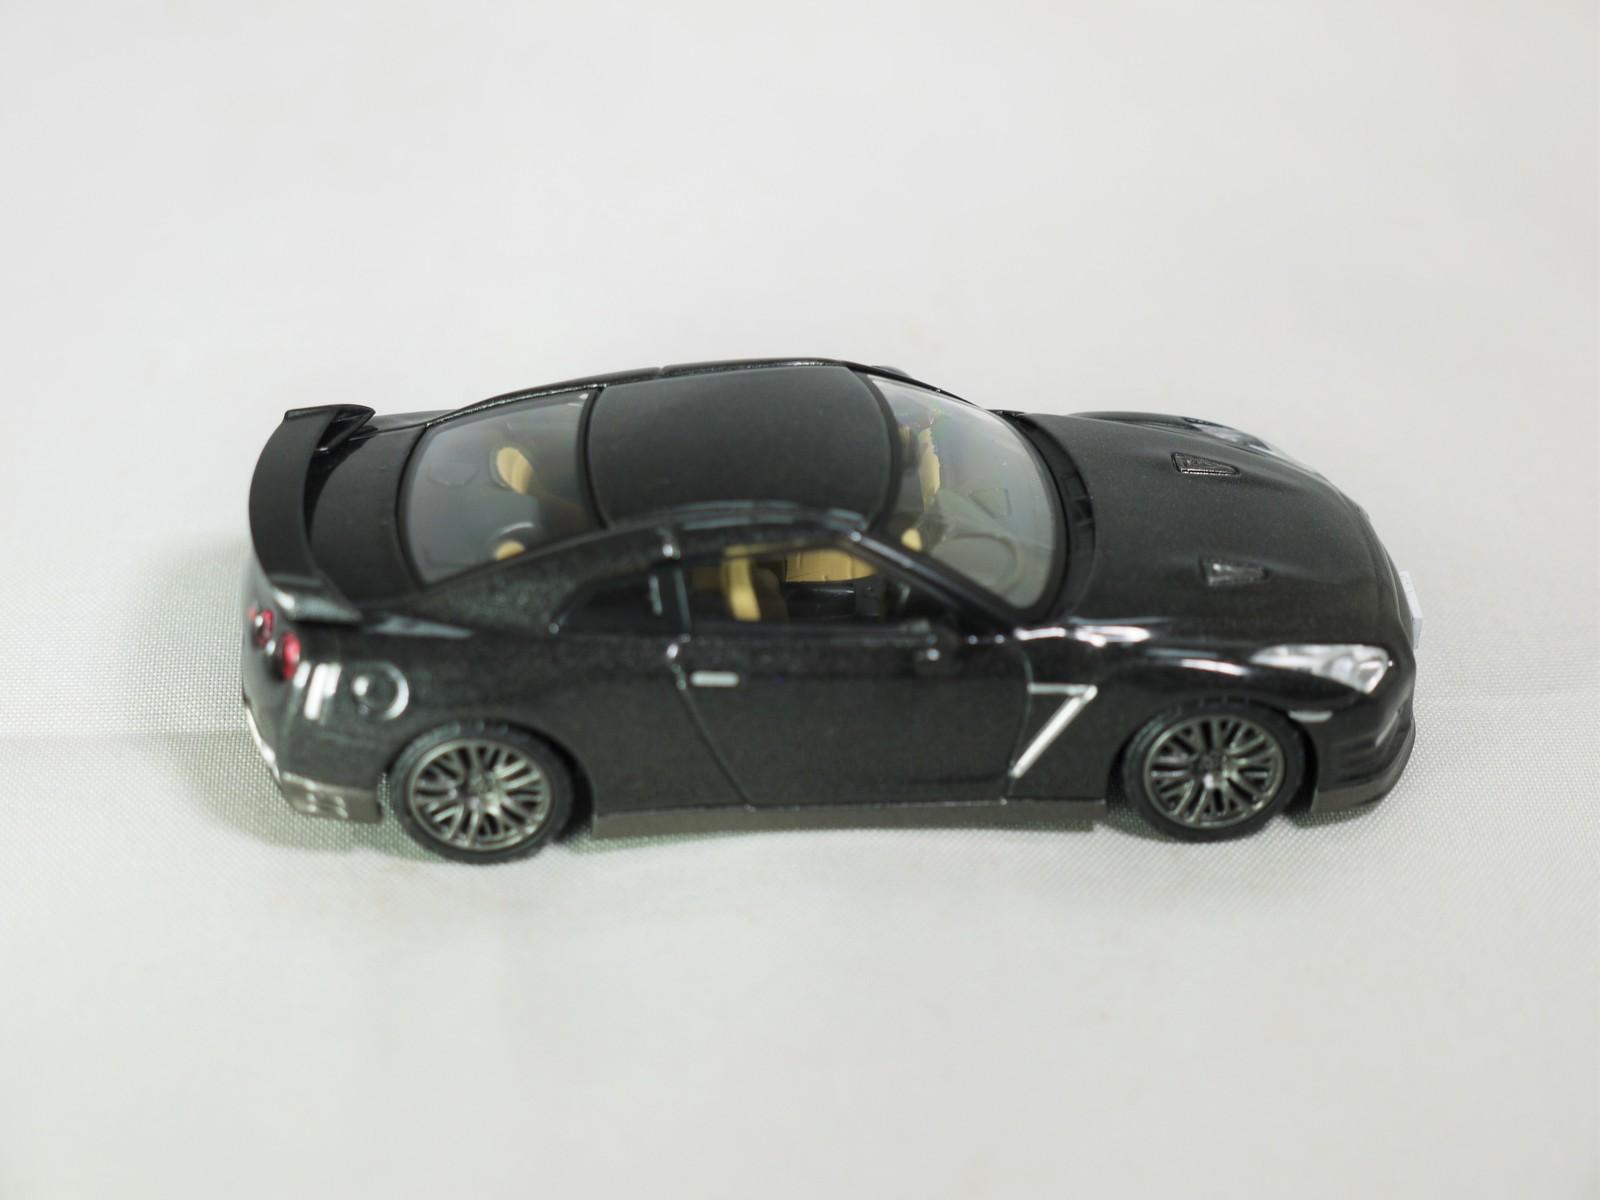 TAKARA TOMY TOMICA LIMITED TOMYTEC NISSAN GT-R Premium Edition LV-N116c Black